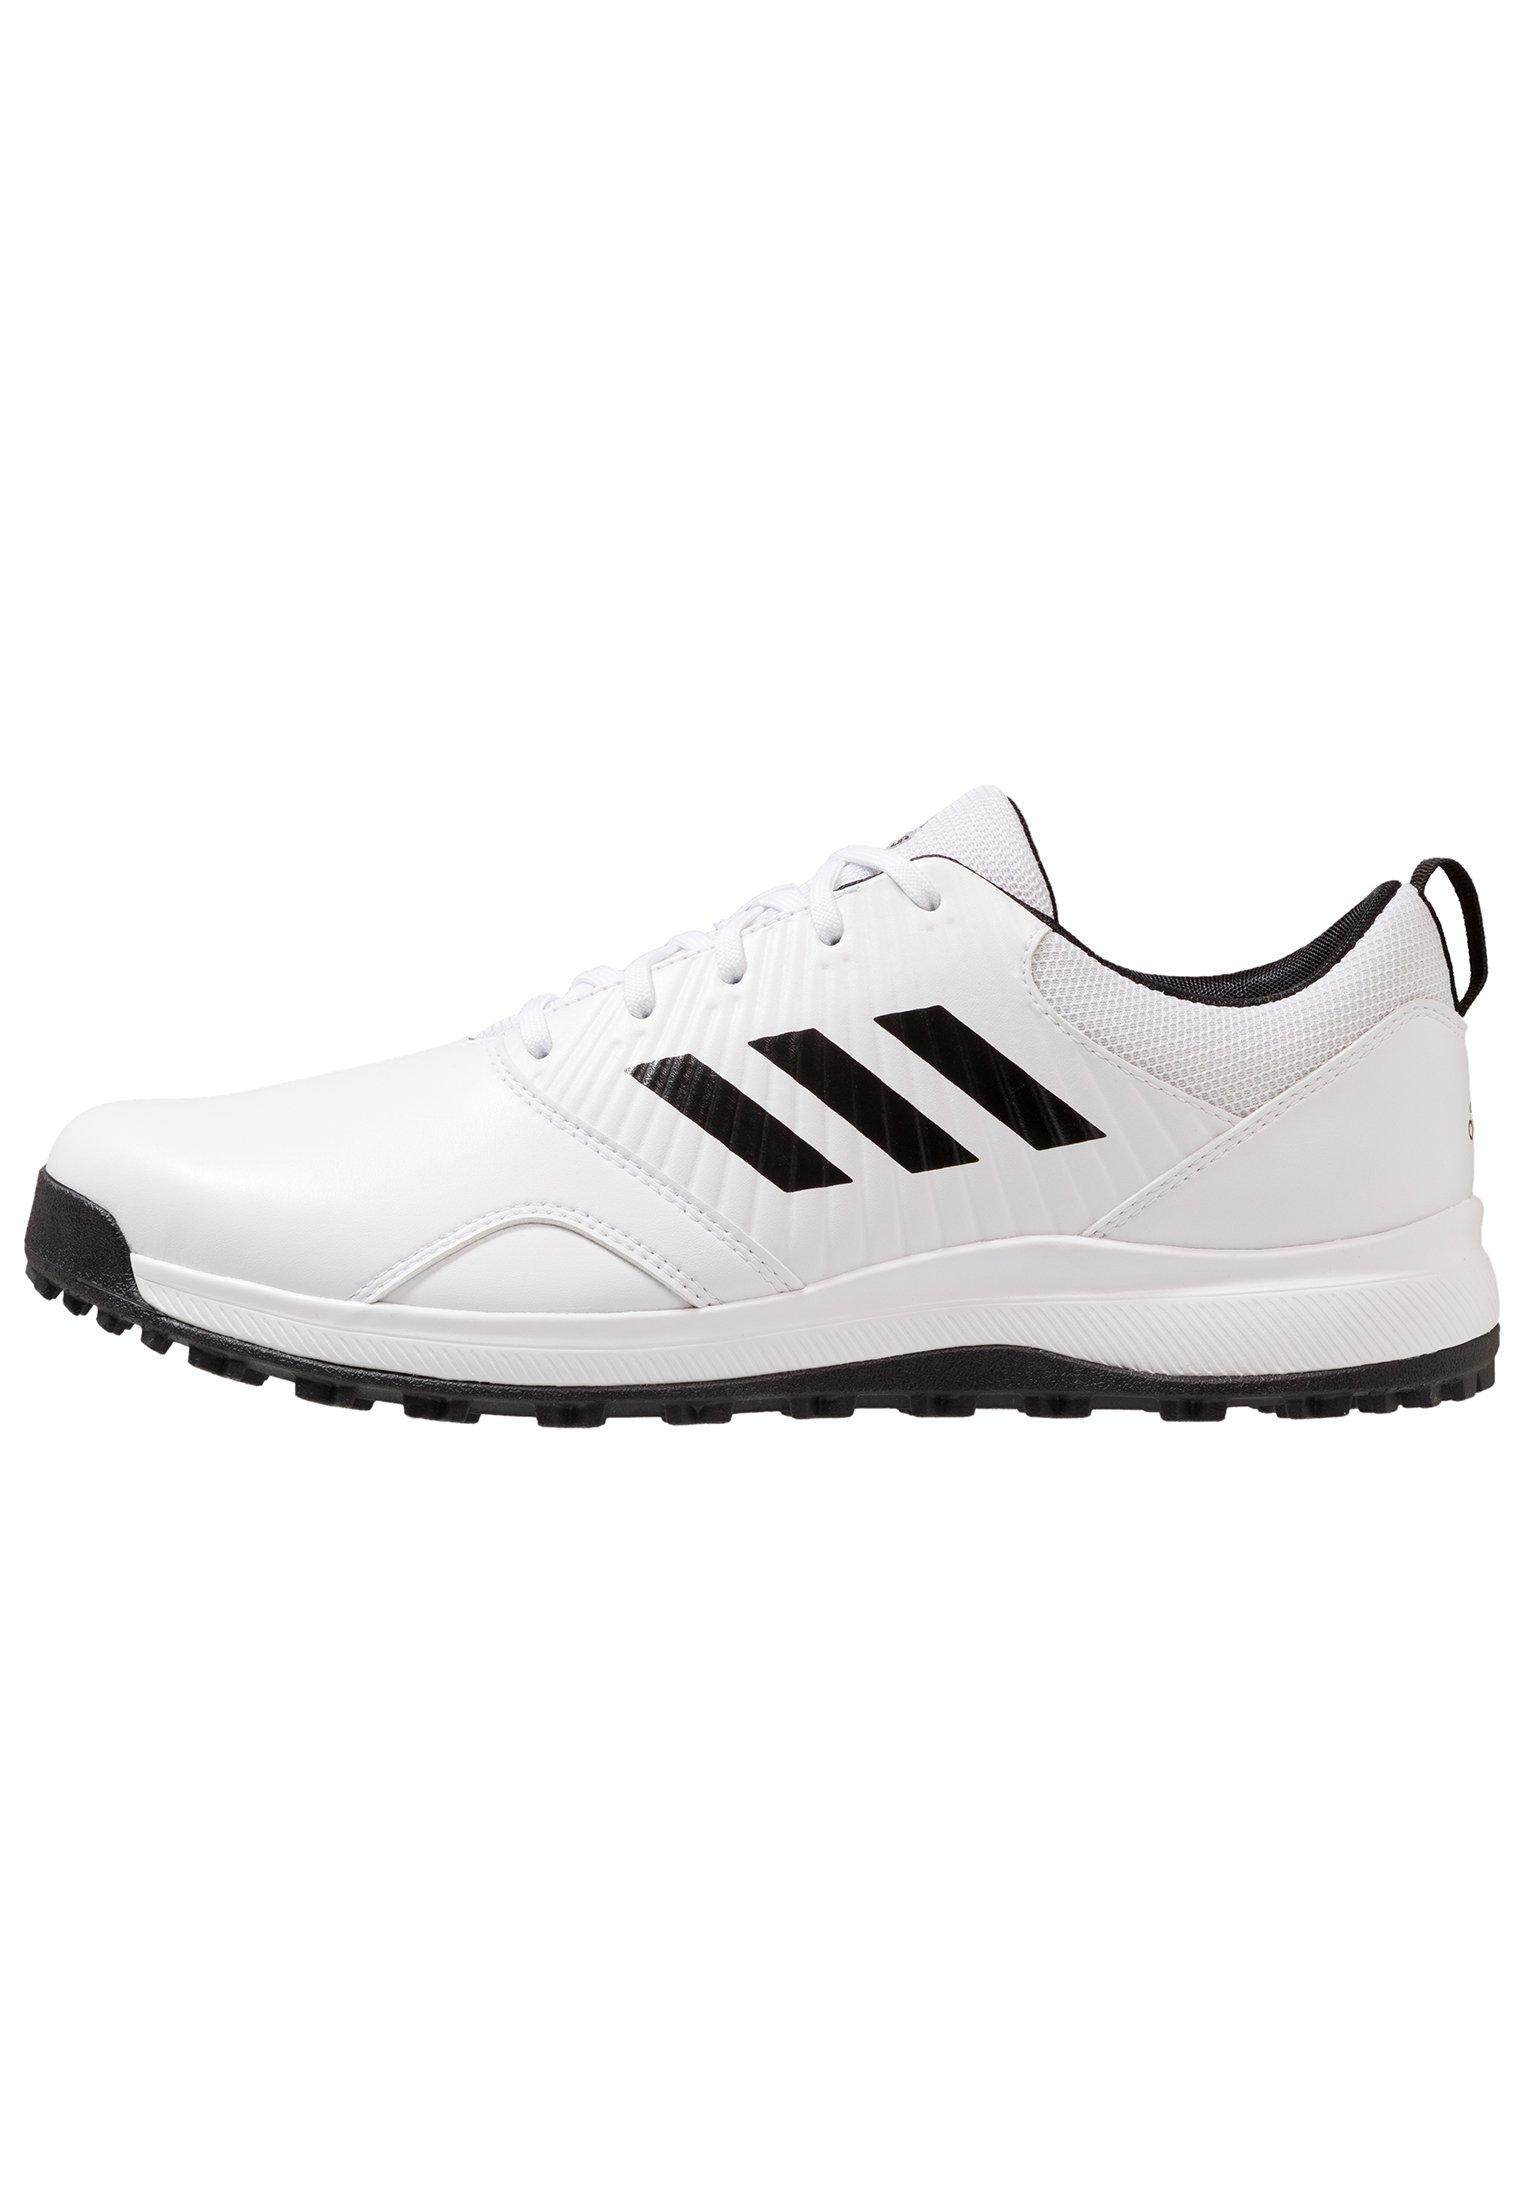 chaussure golf adidas homme